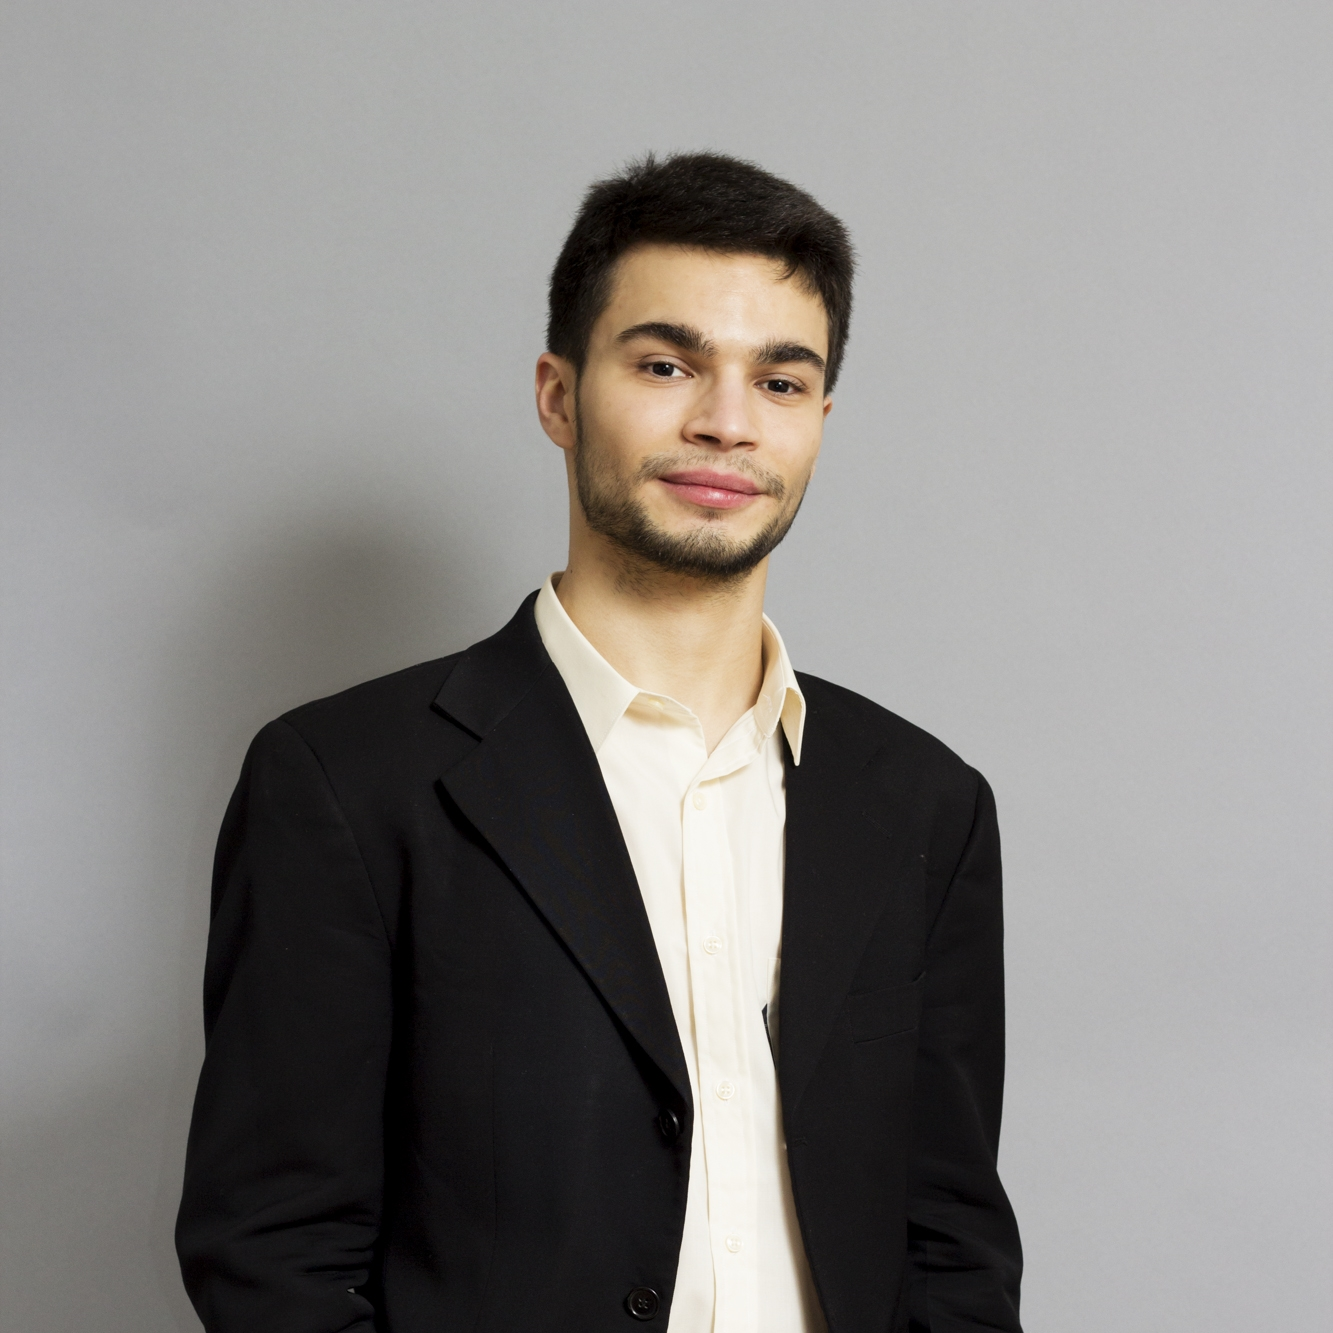 Vicente Alexim — clarinet